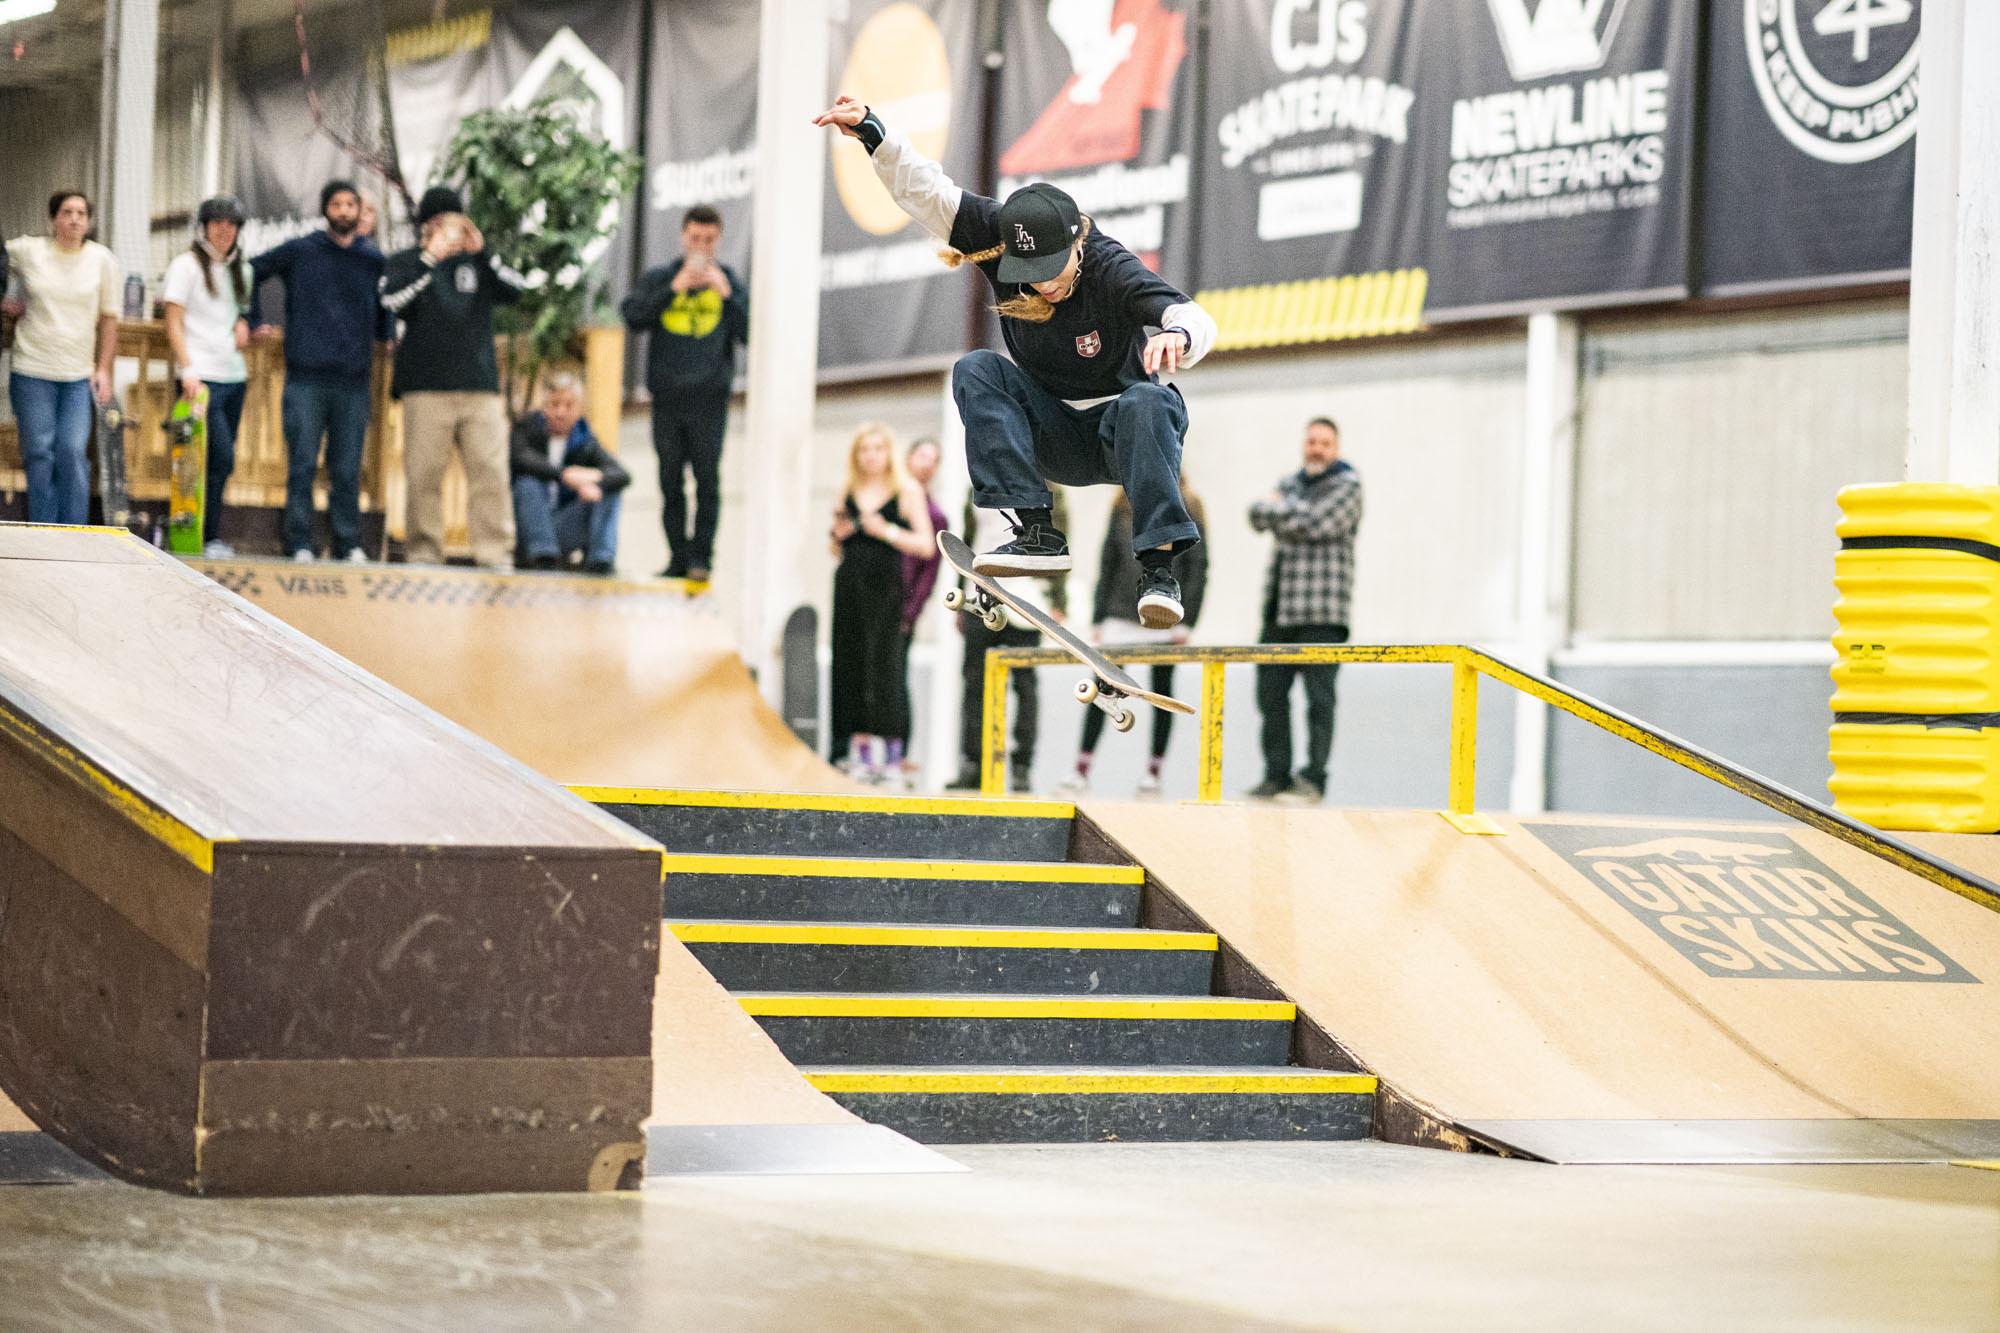 Grant ding a kickflip on skateboard